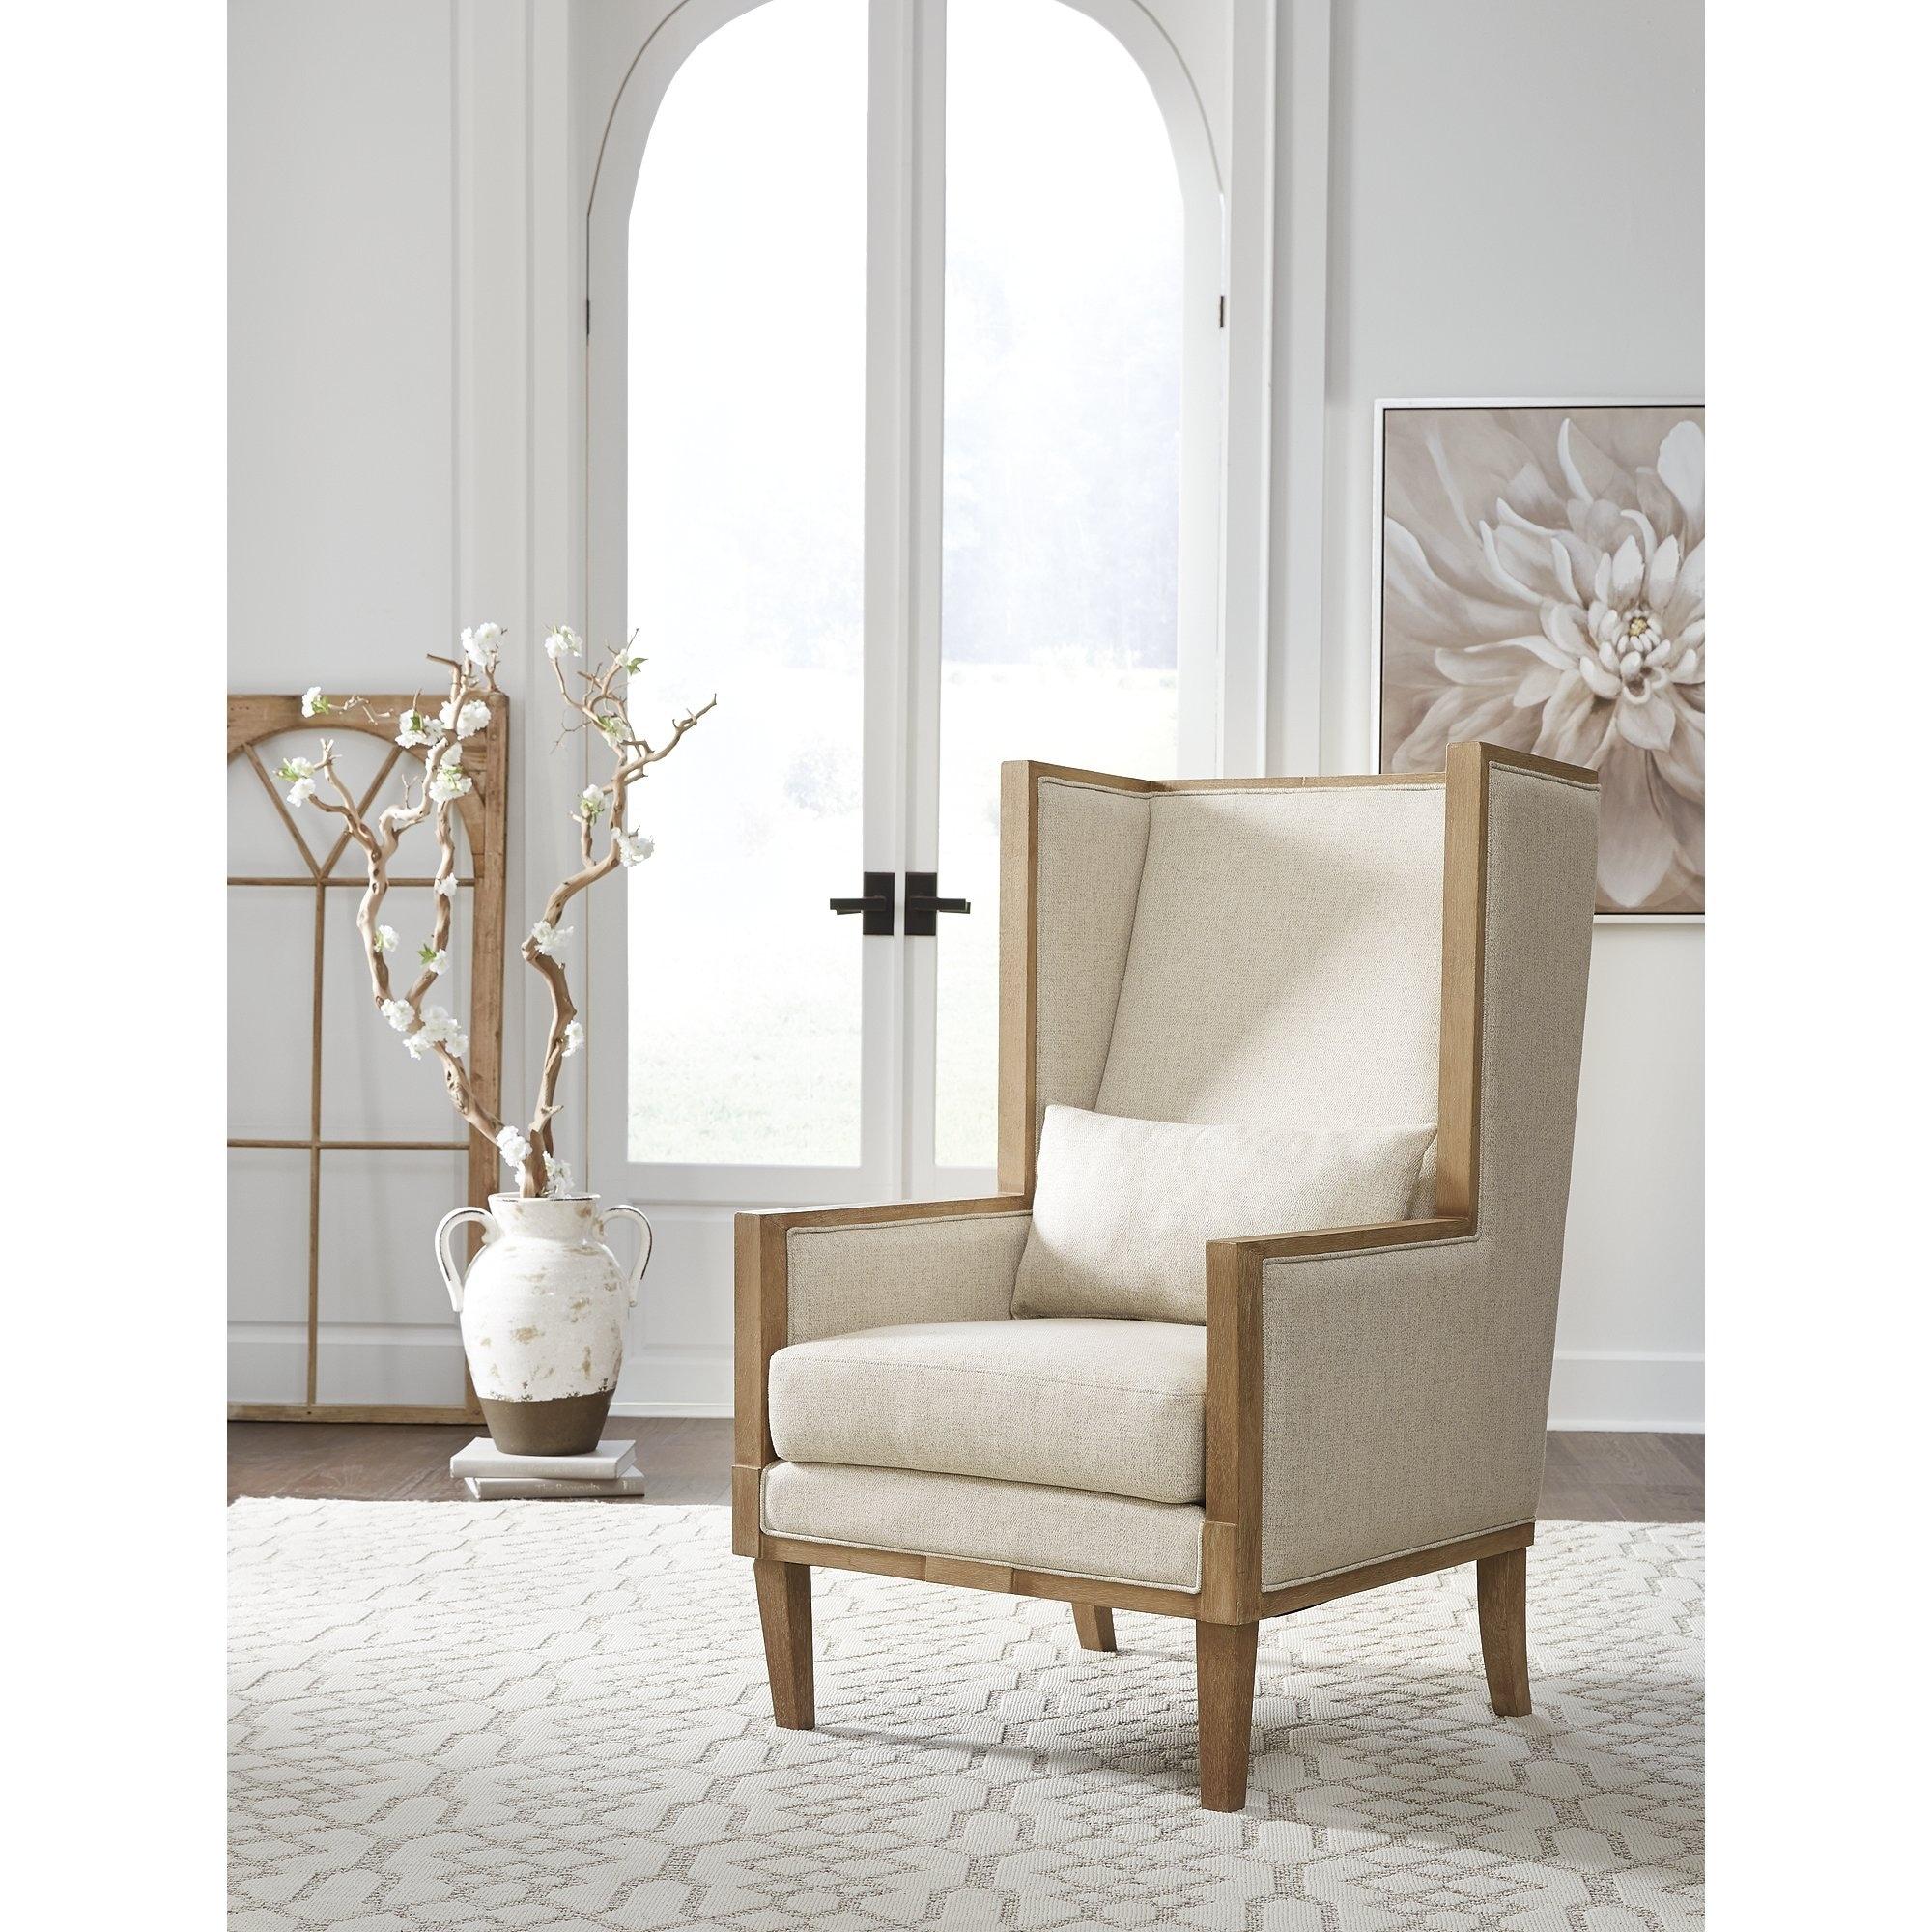 Modern Formal Living Room, Shop Avila Modern Farmhouse Linen Accent Chair 29 W X 32 D X 46 H On Sale Overstock 31851387